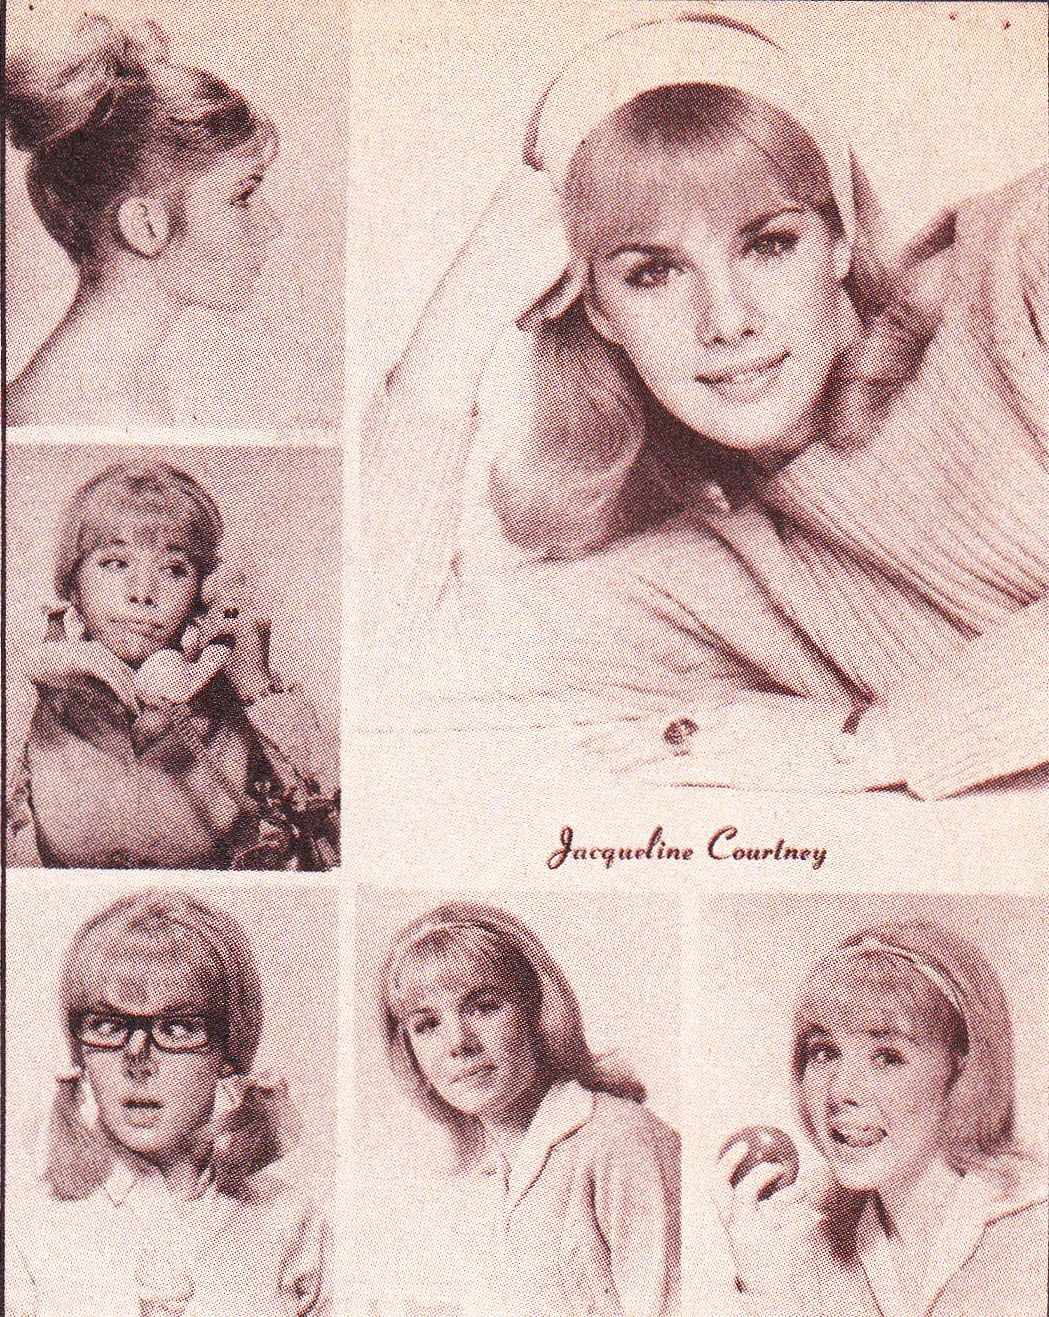 Jacqueline Courtney Jacqueline Courtney new foto